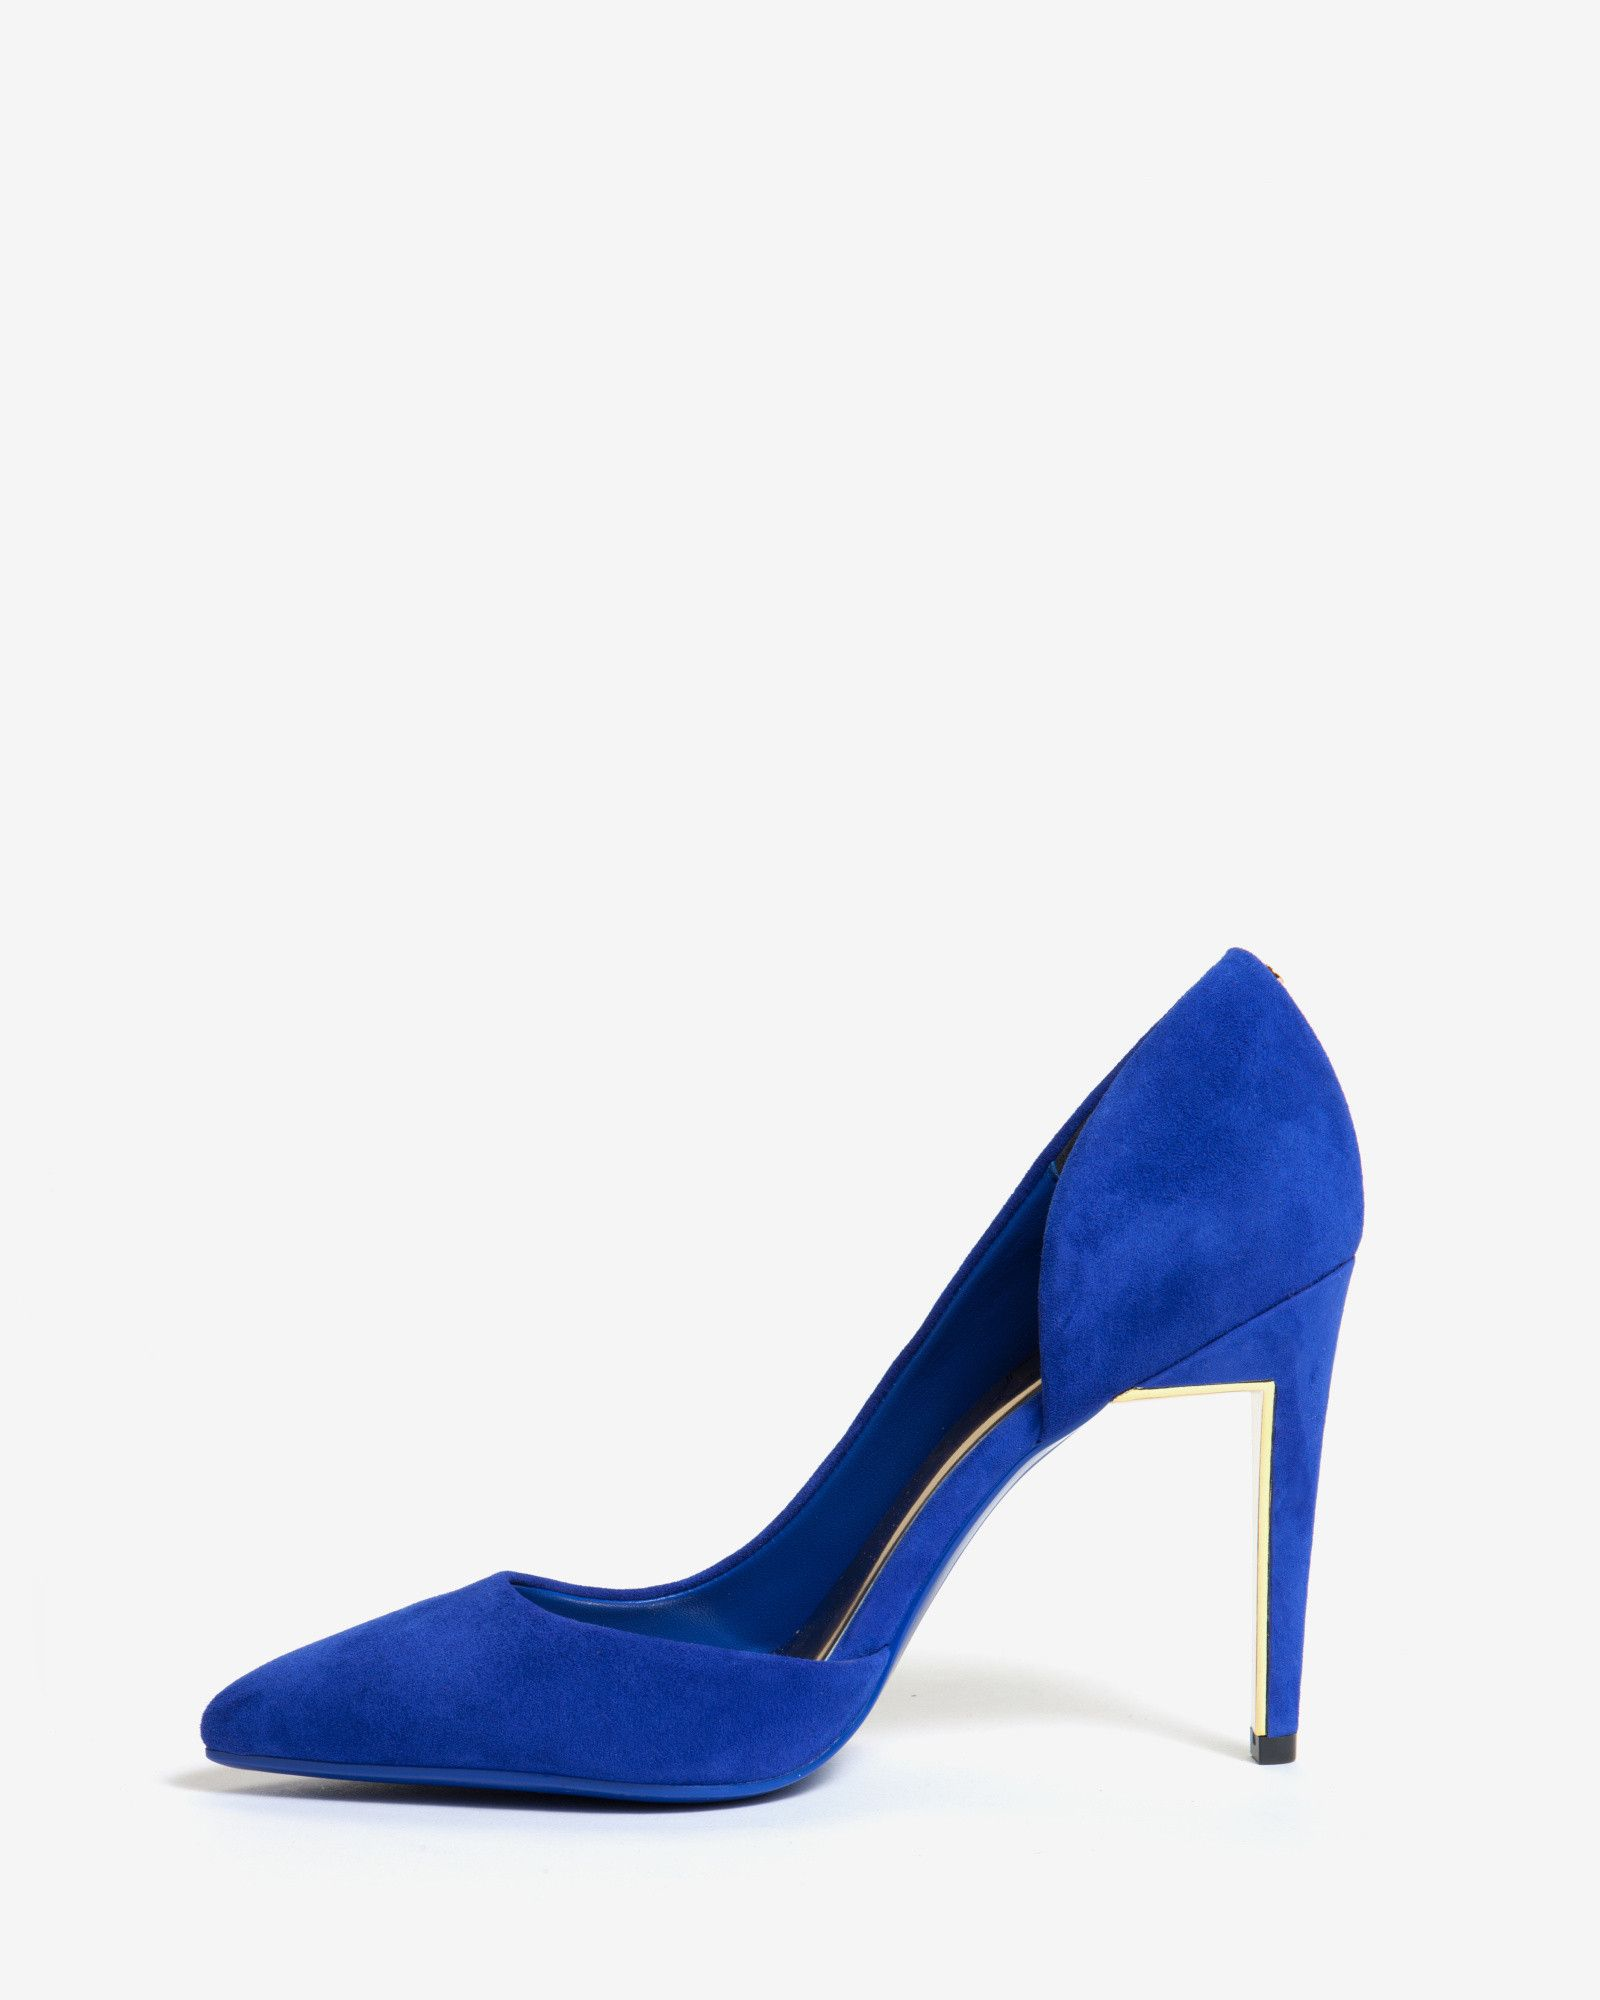 505d68e0f Ted Baker Cobalt Blue Suede 4